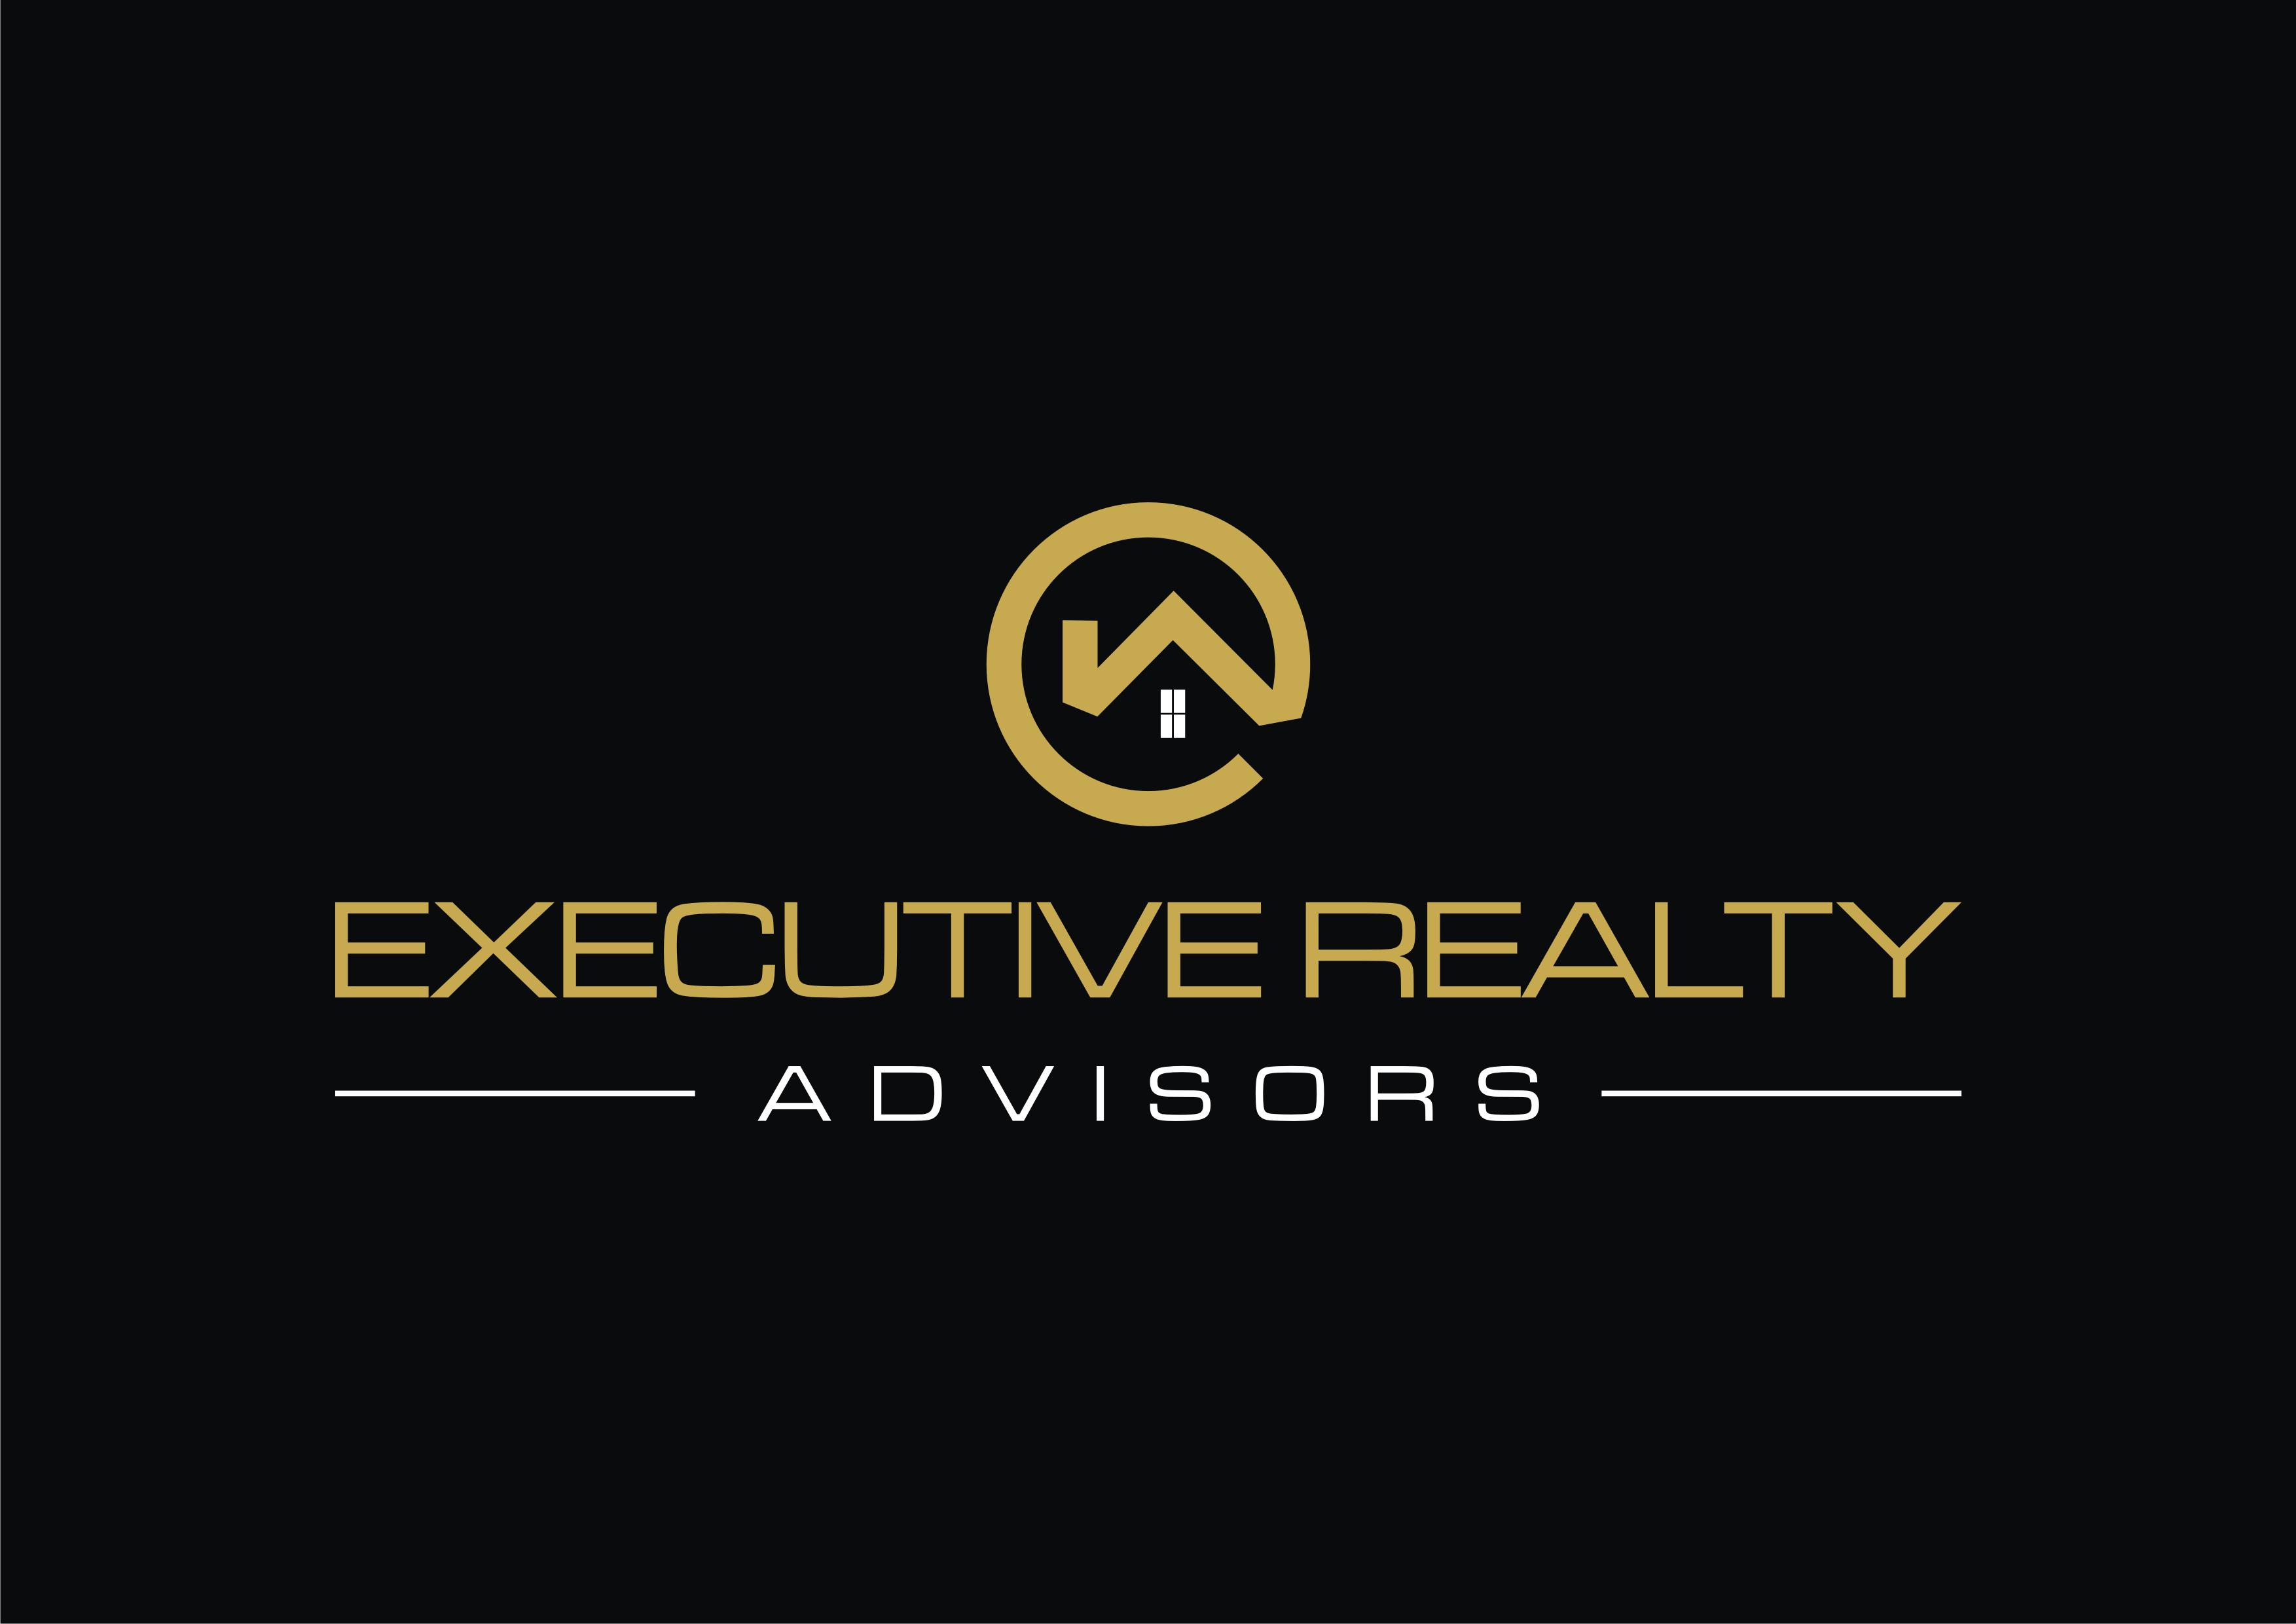 Executive Realty Advisors at Keller Williams logo